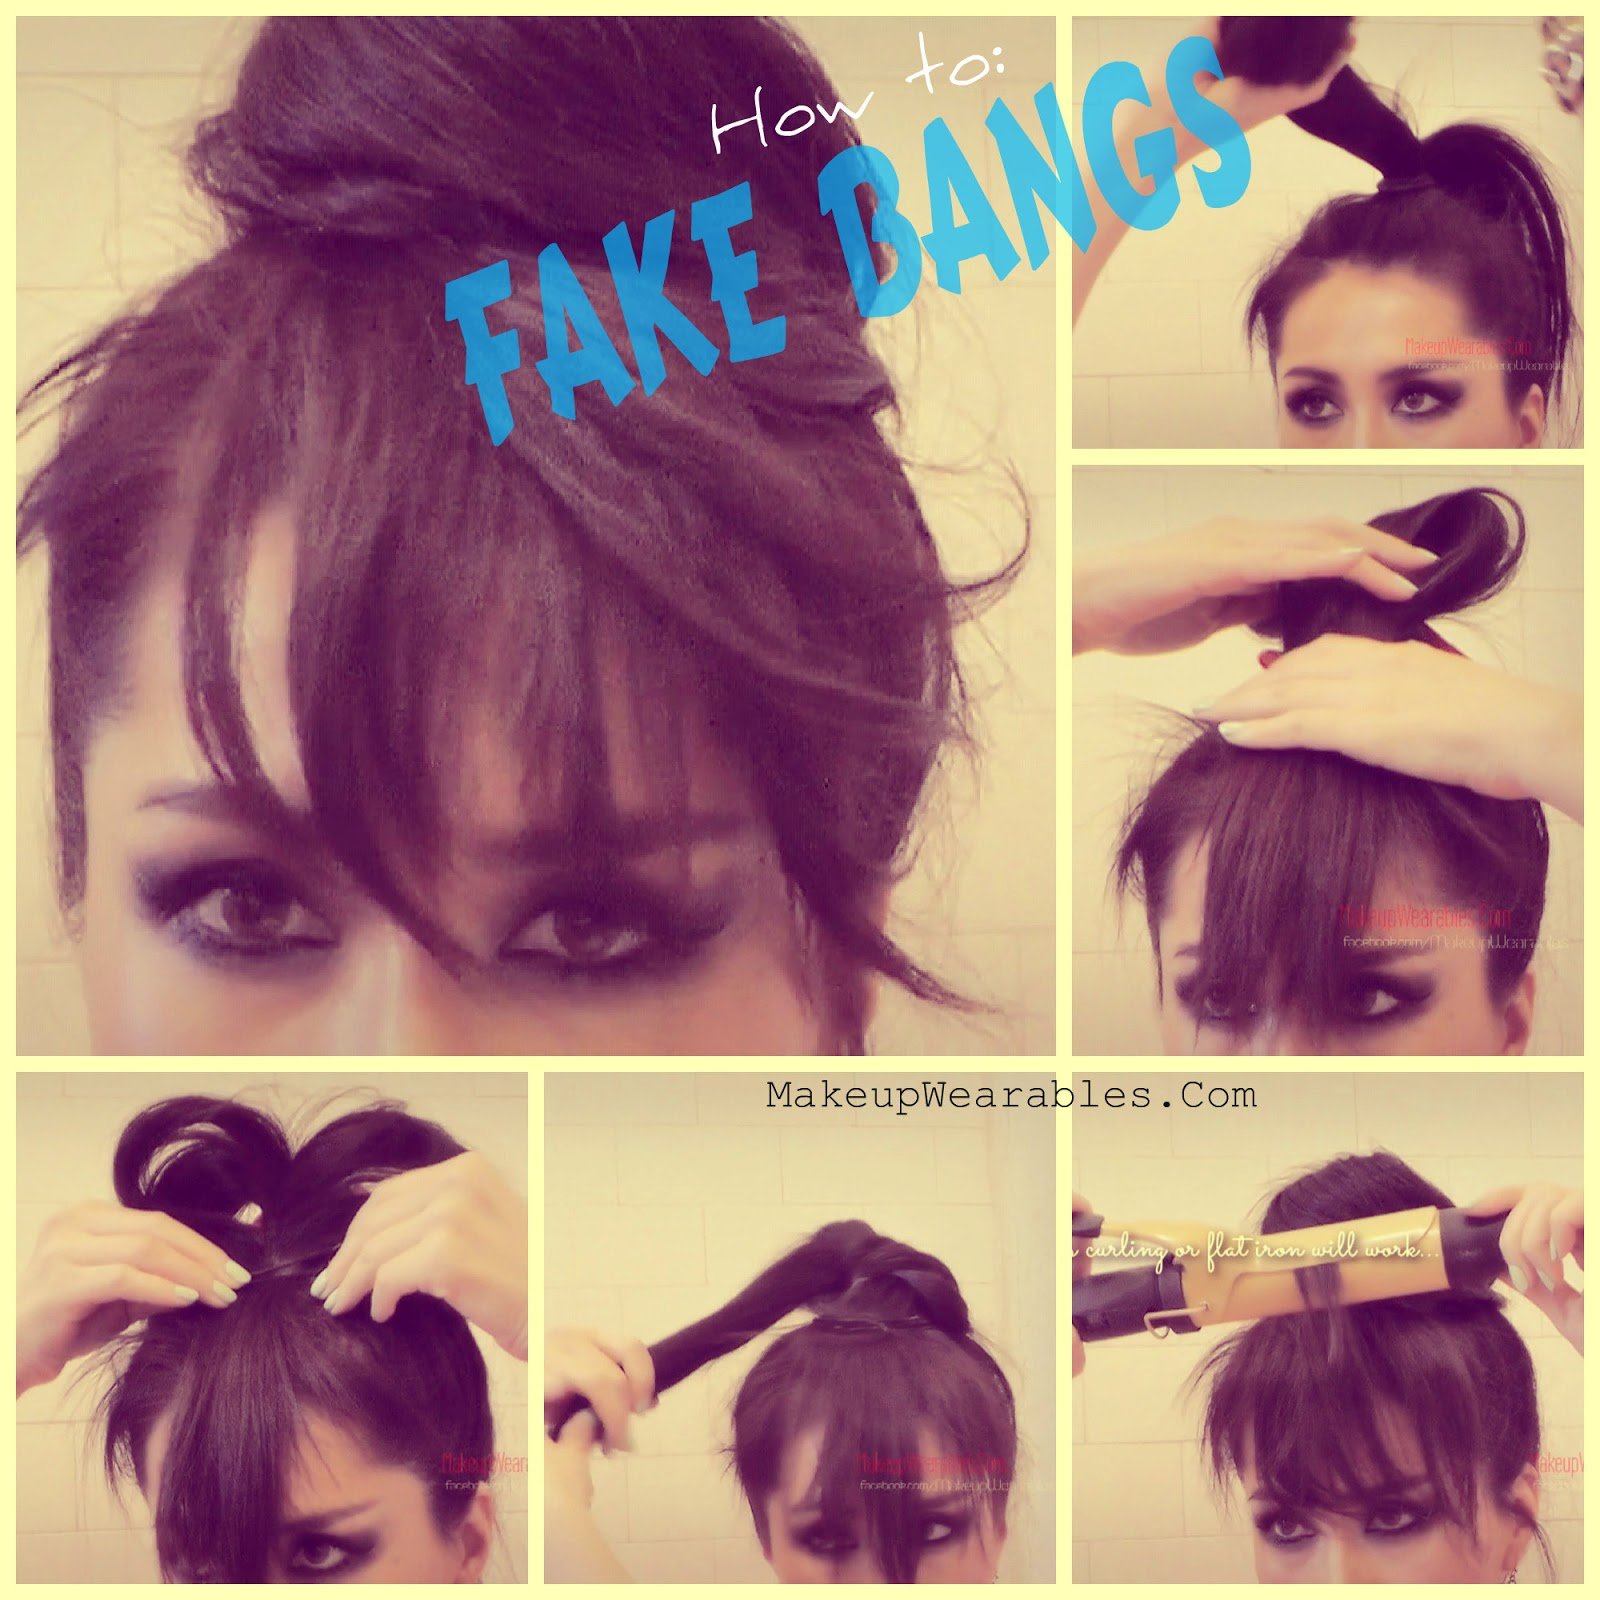 Awe Inspiring How To Fake Bangs Cute Easy Bun Hairstyles Hair Tutorial Video Short Hairstyles Gunalazisus